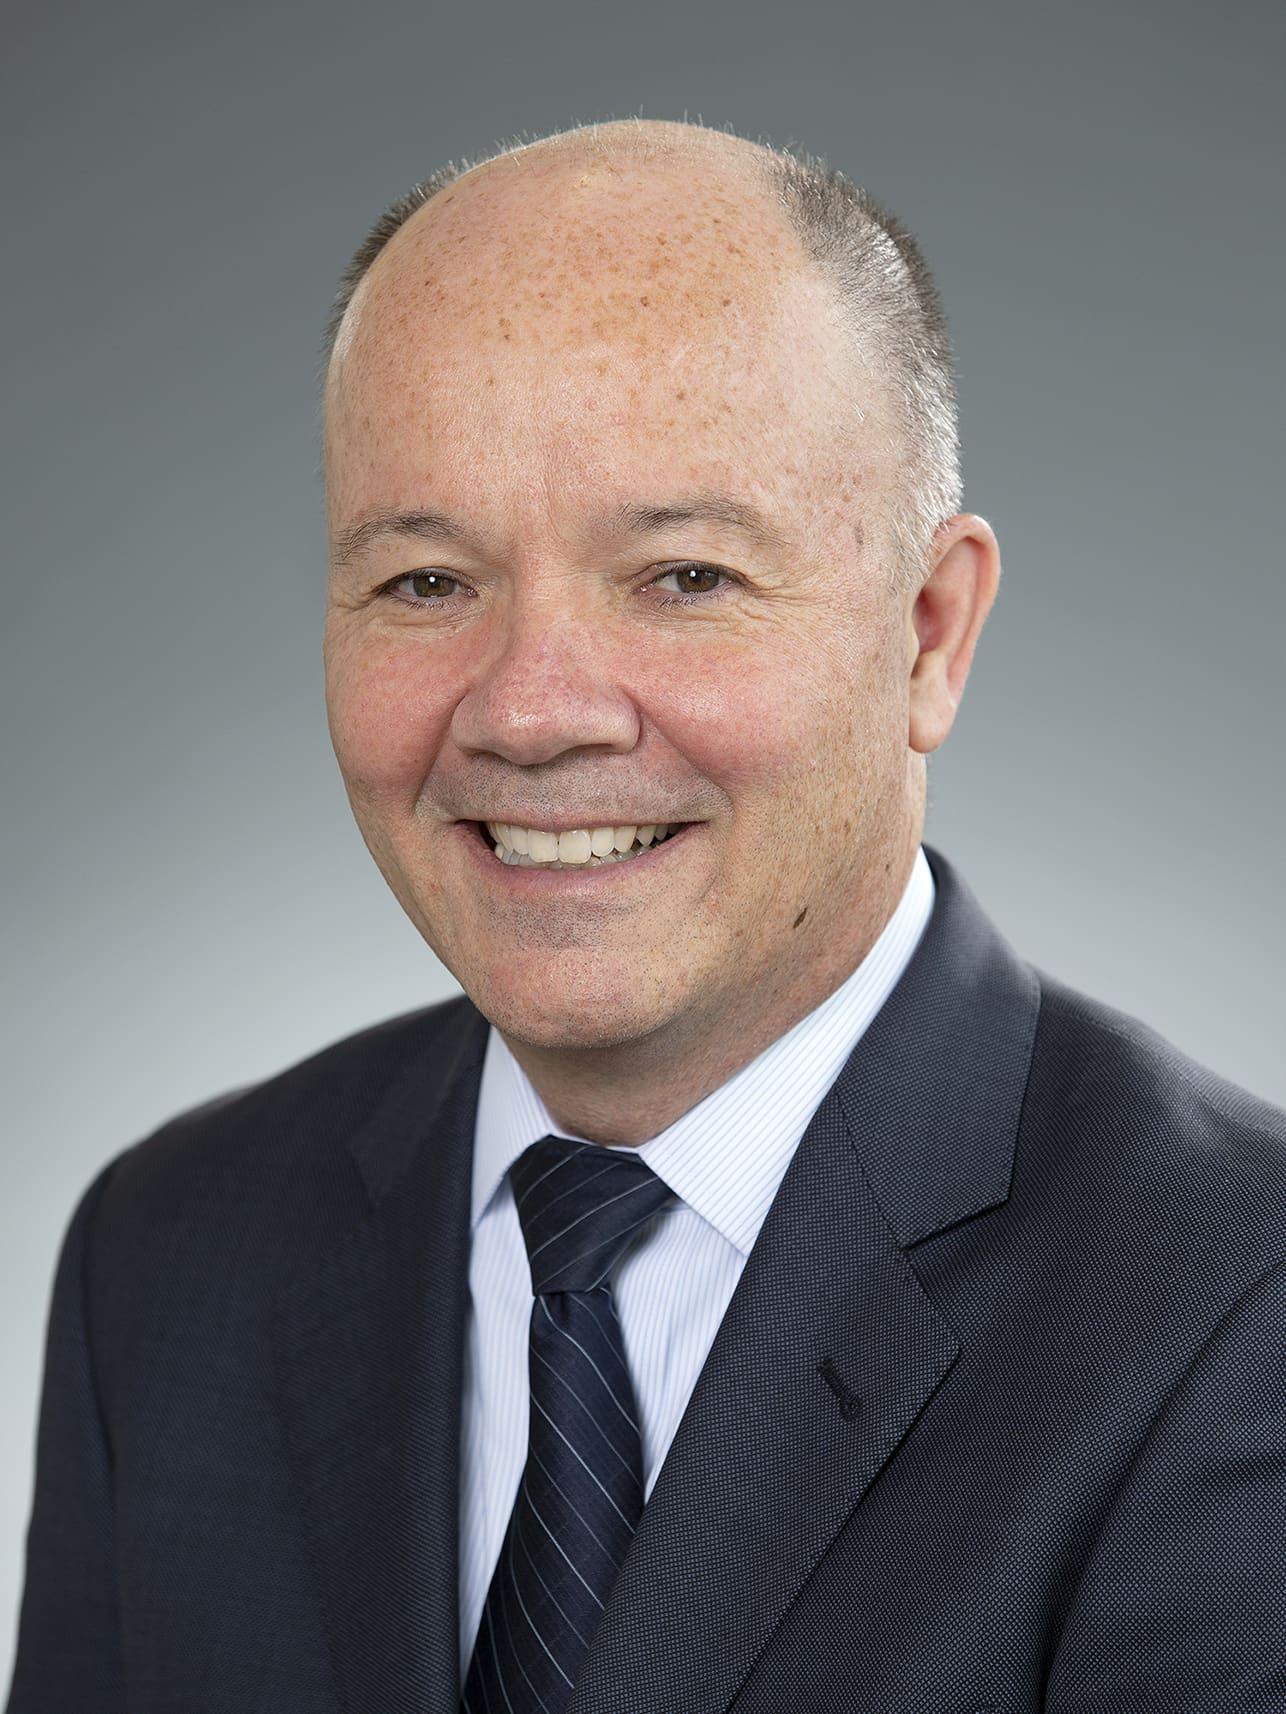 Michael F. Murray